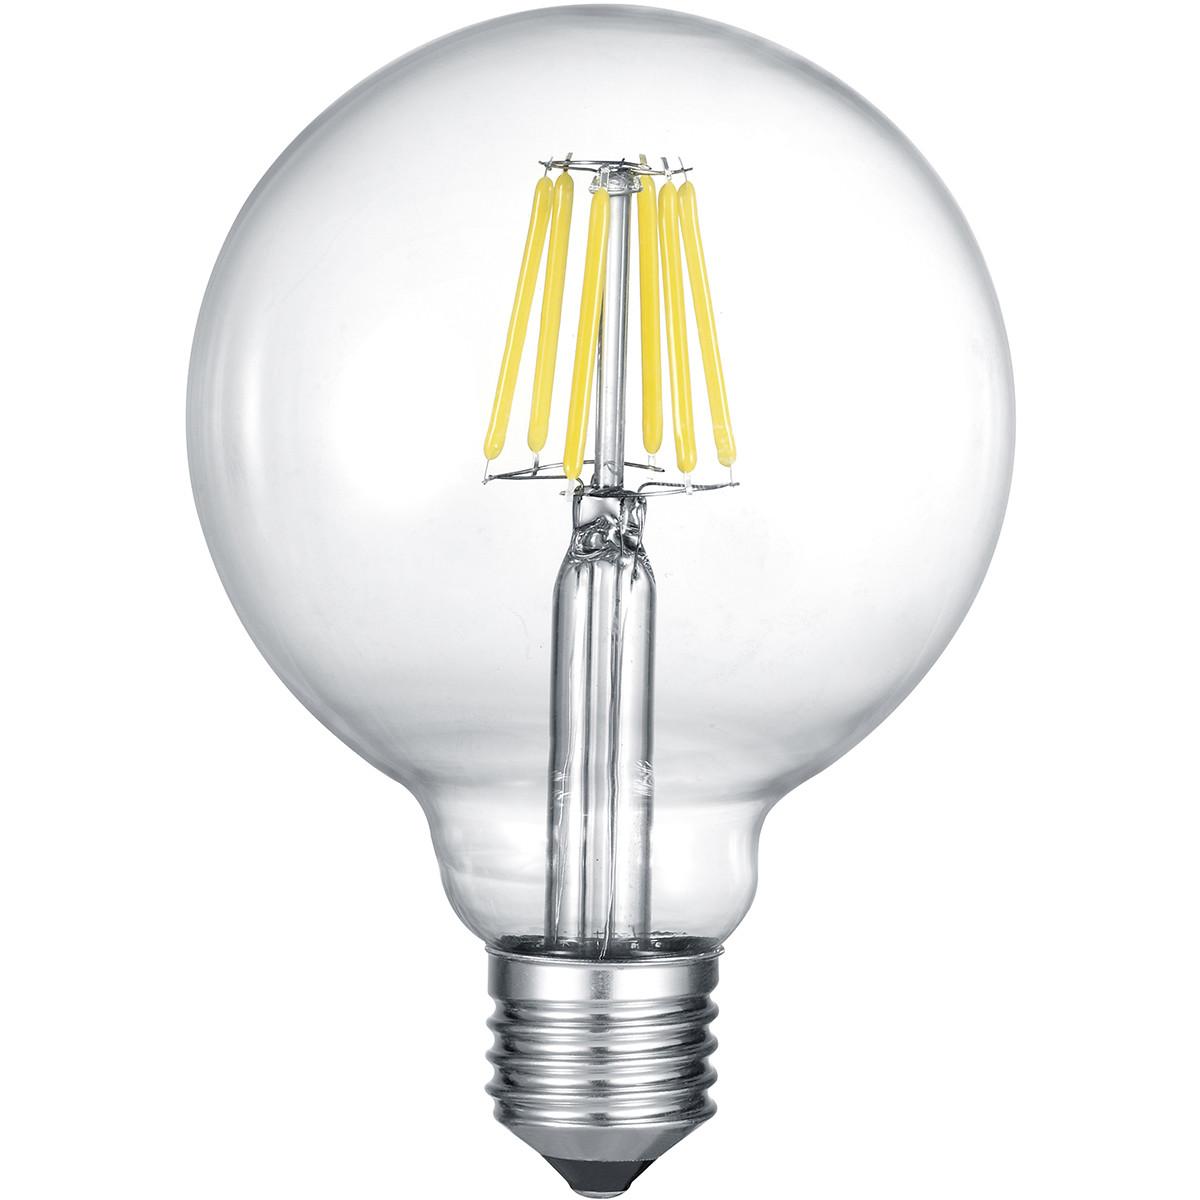 LED Lamp - Filament - Trion Globin XL - E27 Fitting - 8W - Warm Wit 2700K - Transparent Helder - Gla